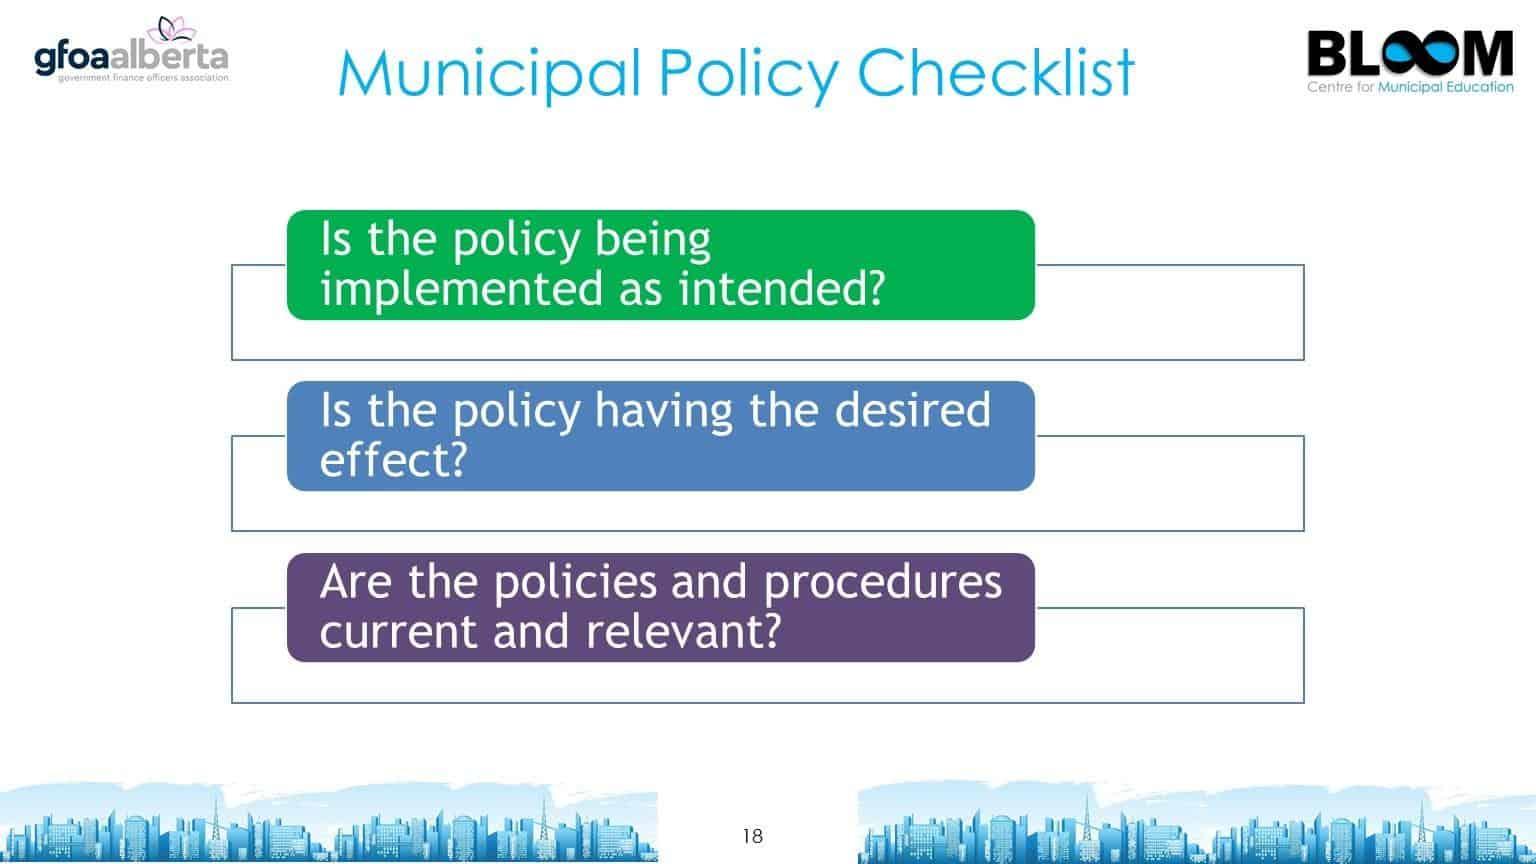 Municipal policy checklist